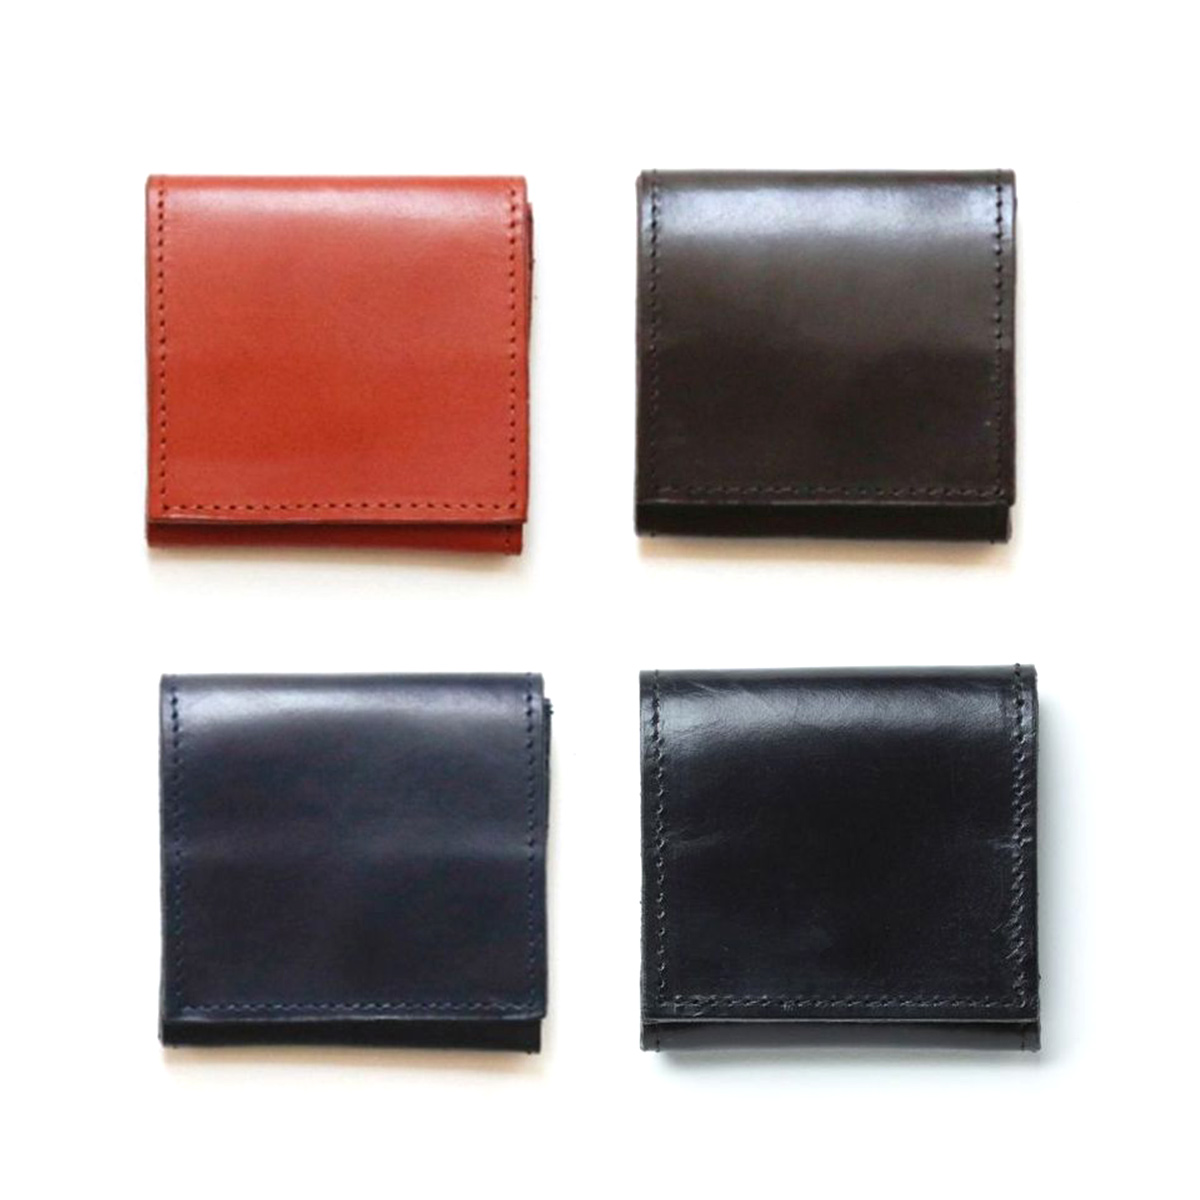 GLENROYAL / STANDARD COIN CASE